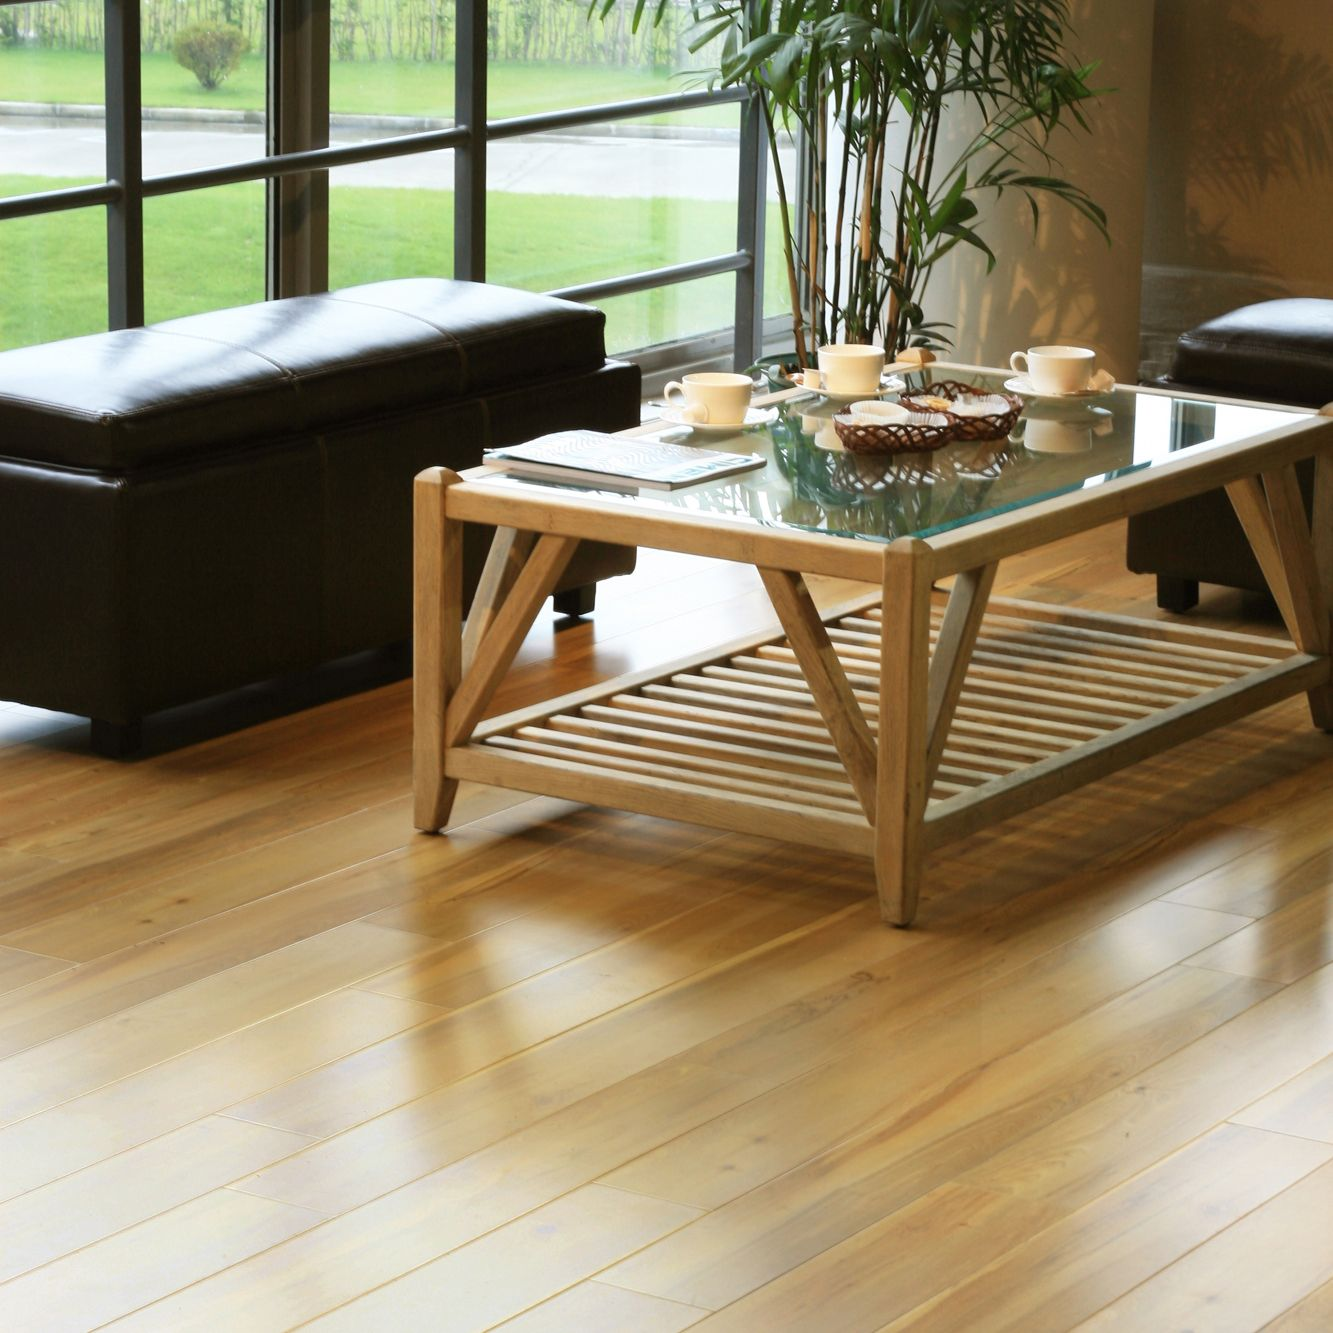 Scherzo Light Walnut Effect Laminate Flooring 1 21 M² Pack Departments Diy At B Q